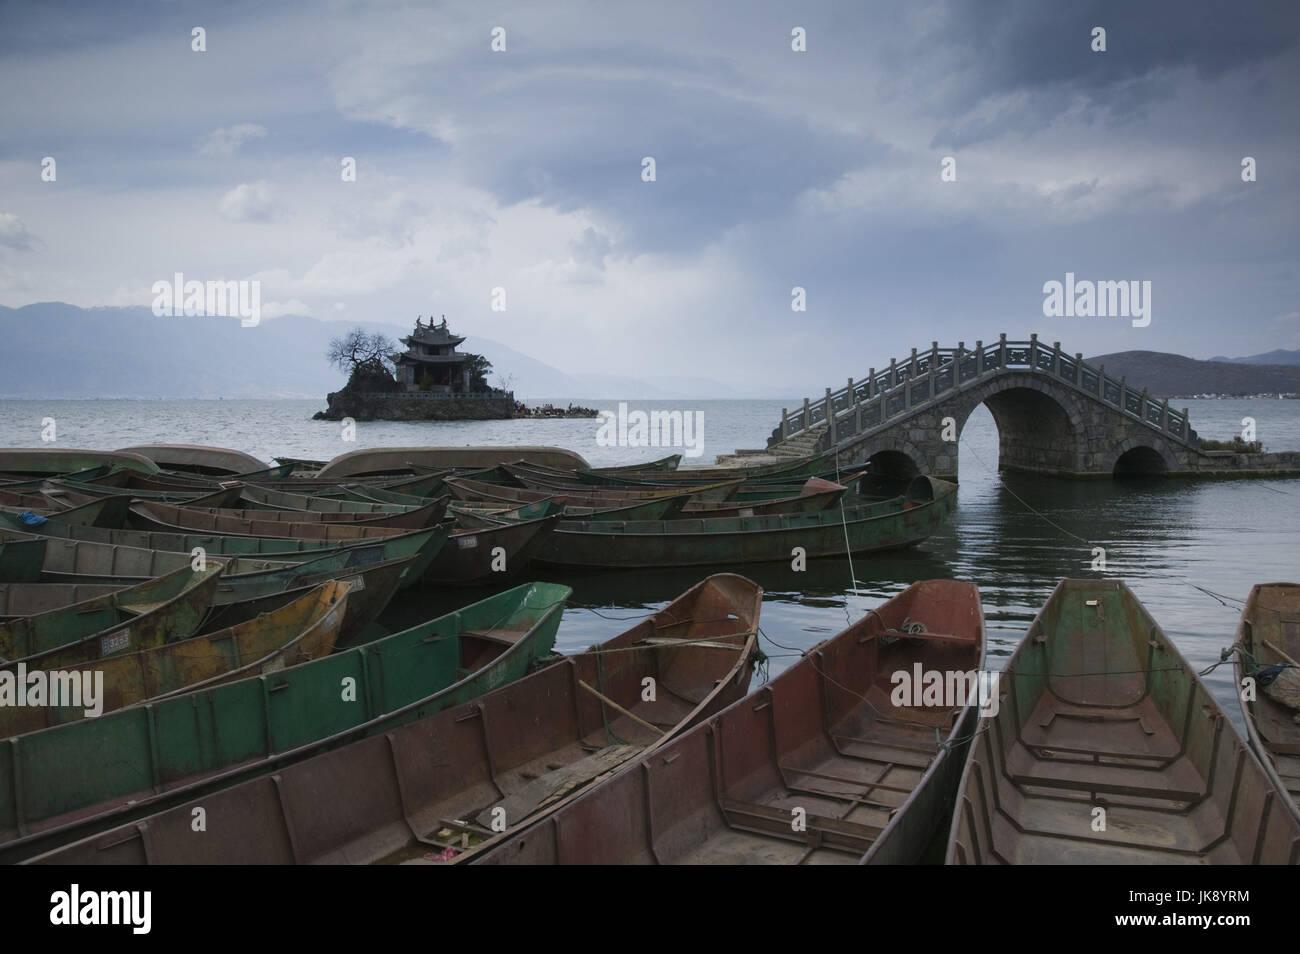 Cina, Provinz Yunnan, Wase, vedere, Herhai Hu, Ufer, Boote, Insel, Putuo, Brücke, Tempel, Foto Stock